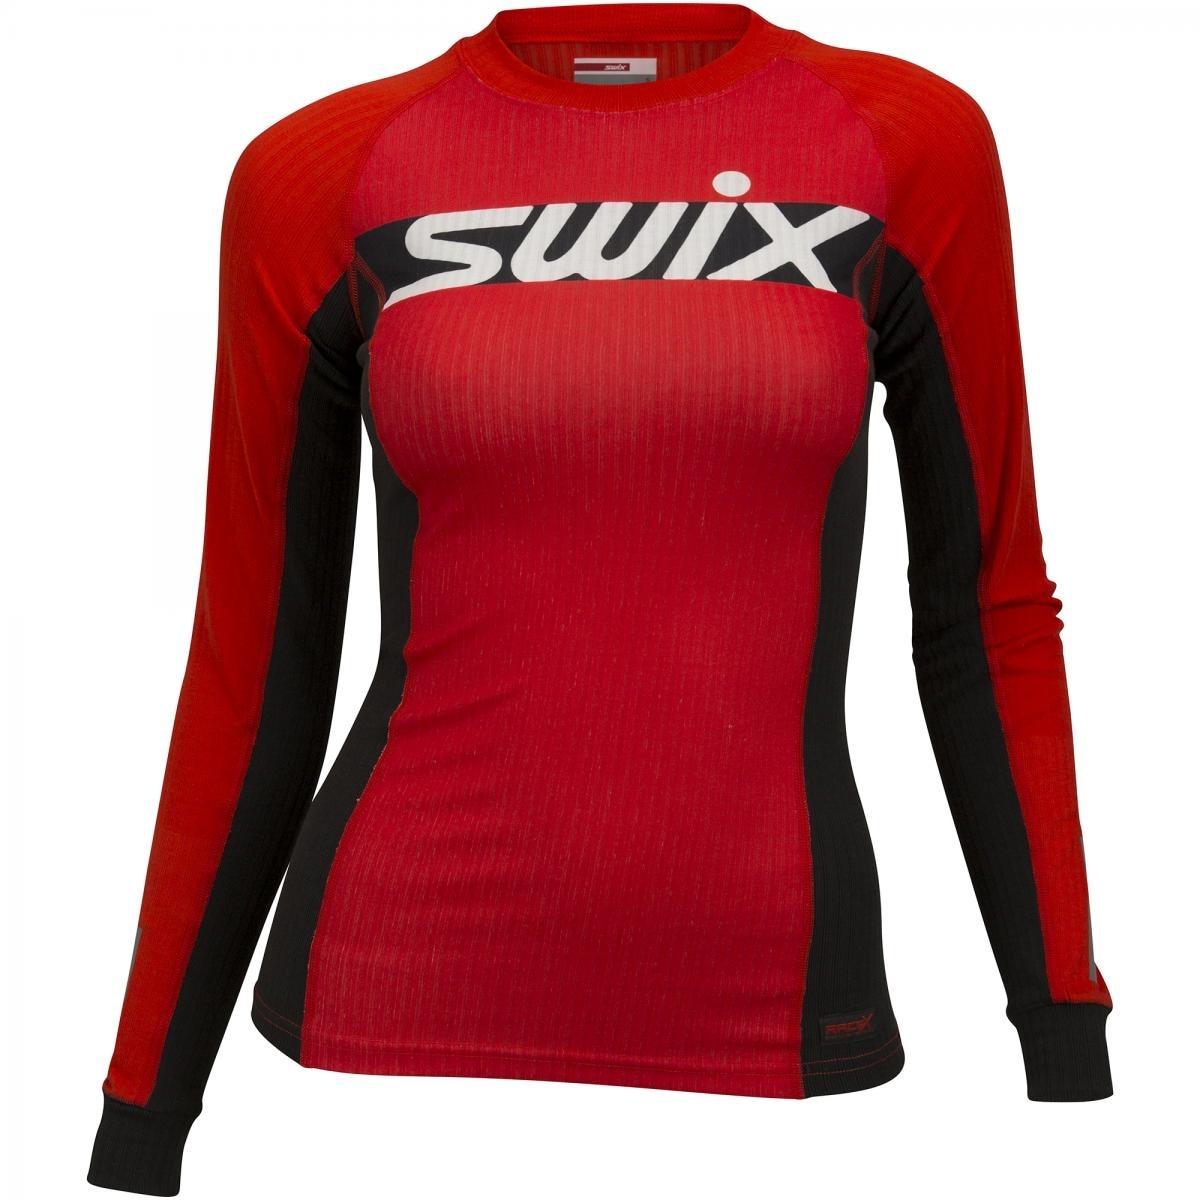 Swix RaceX Carbon Langermet Treningstrøye Dame Rød/Sort